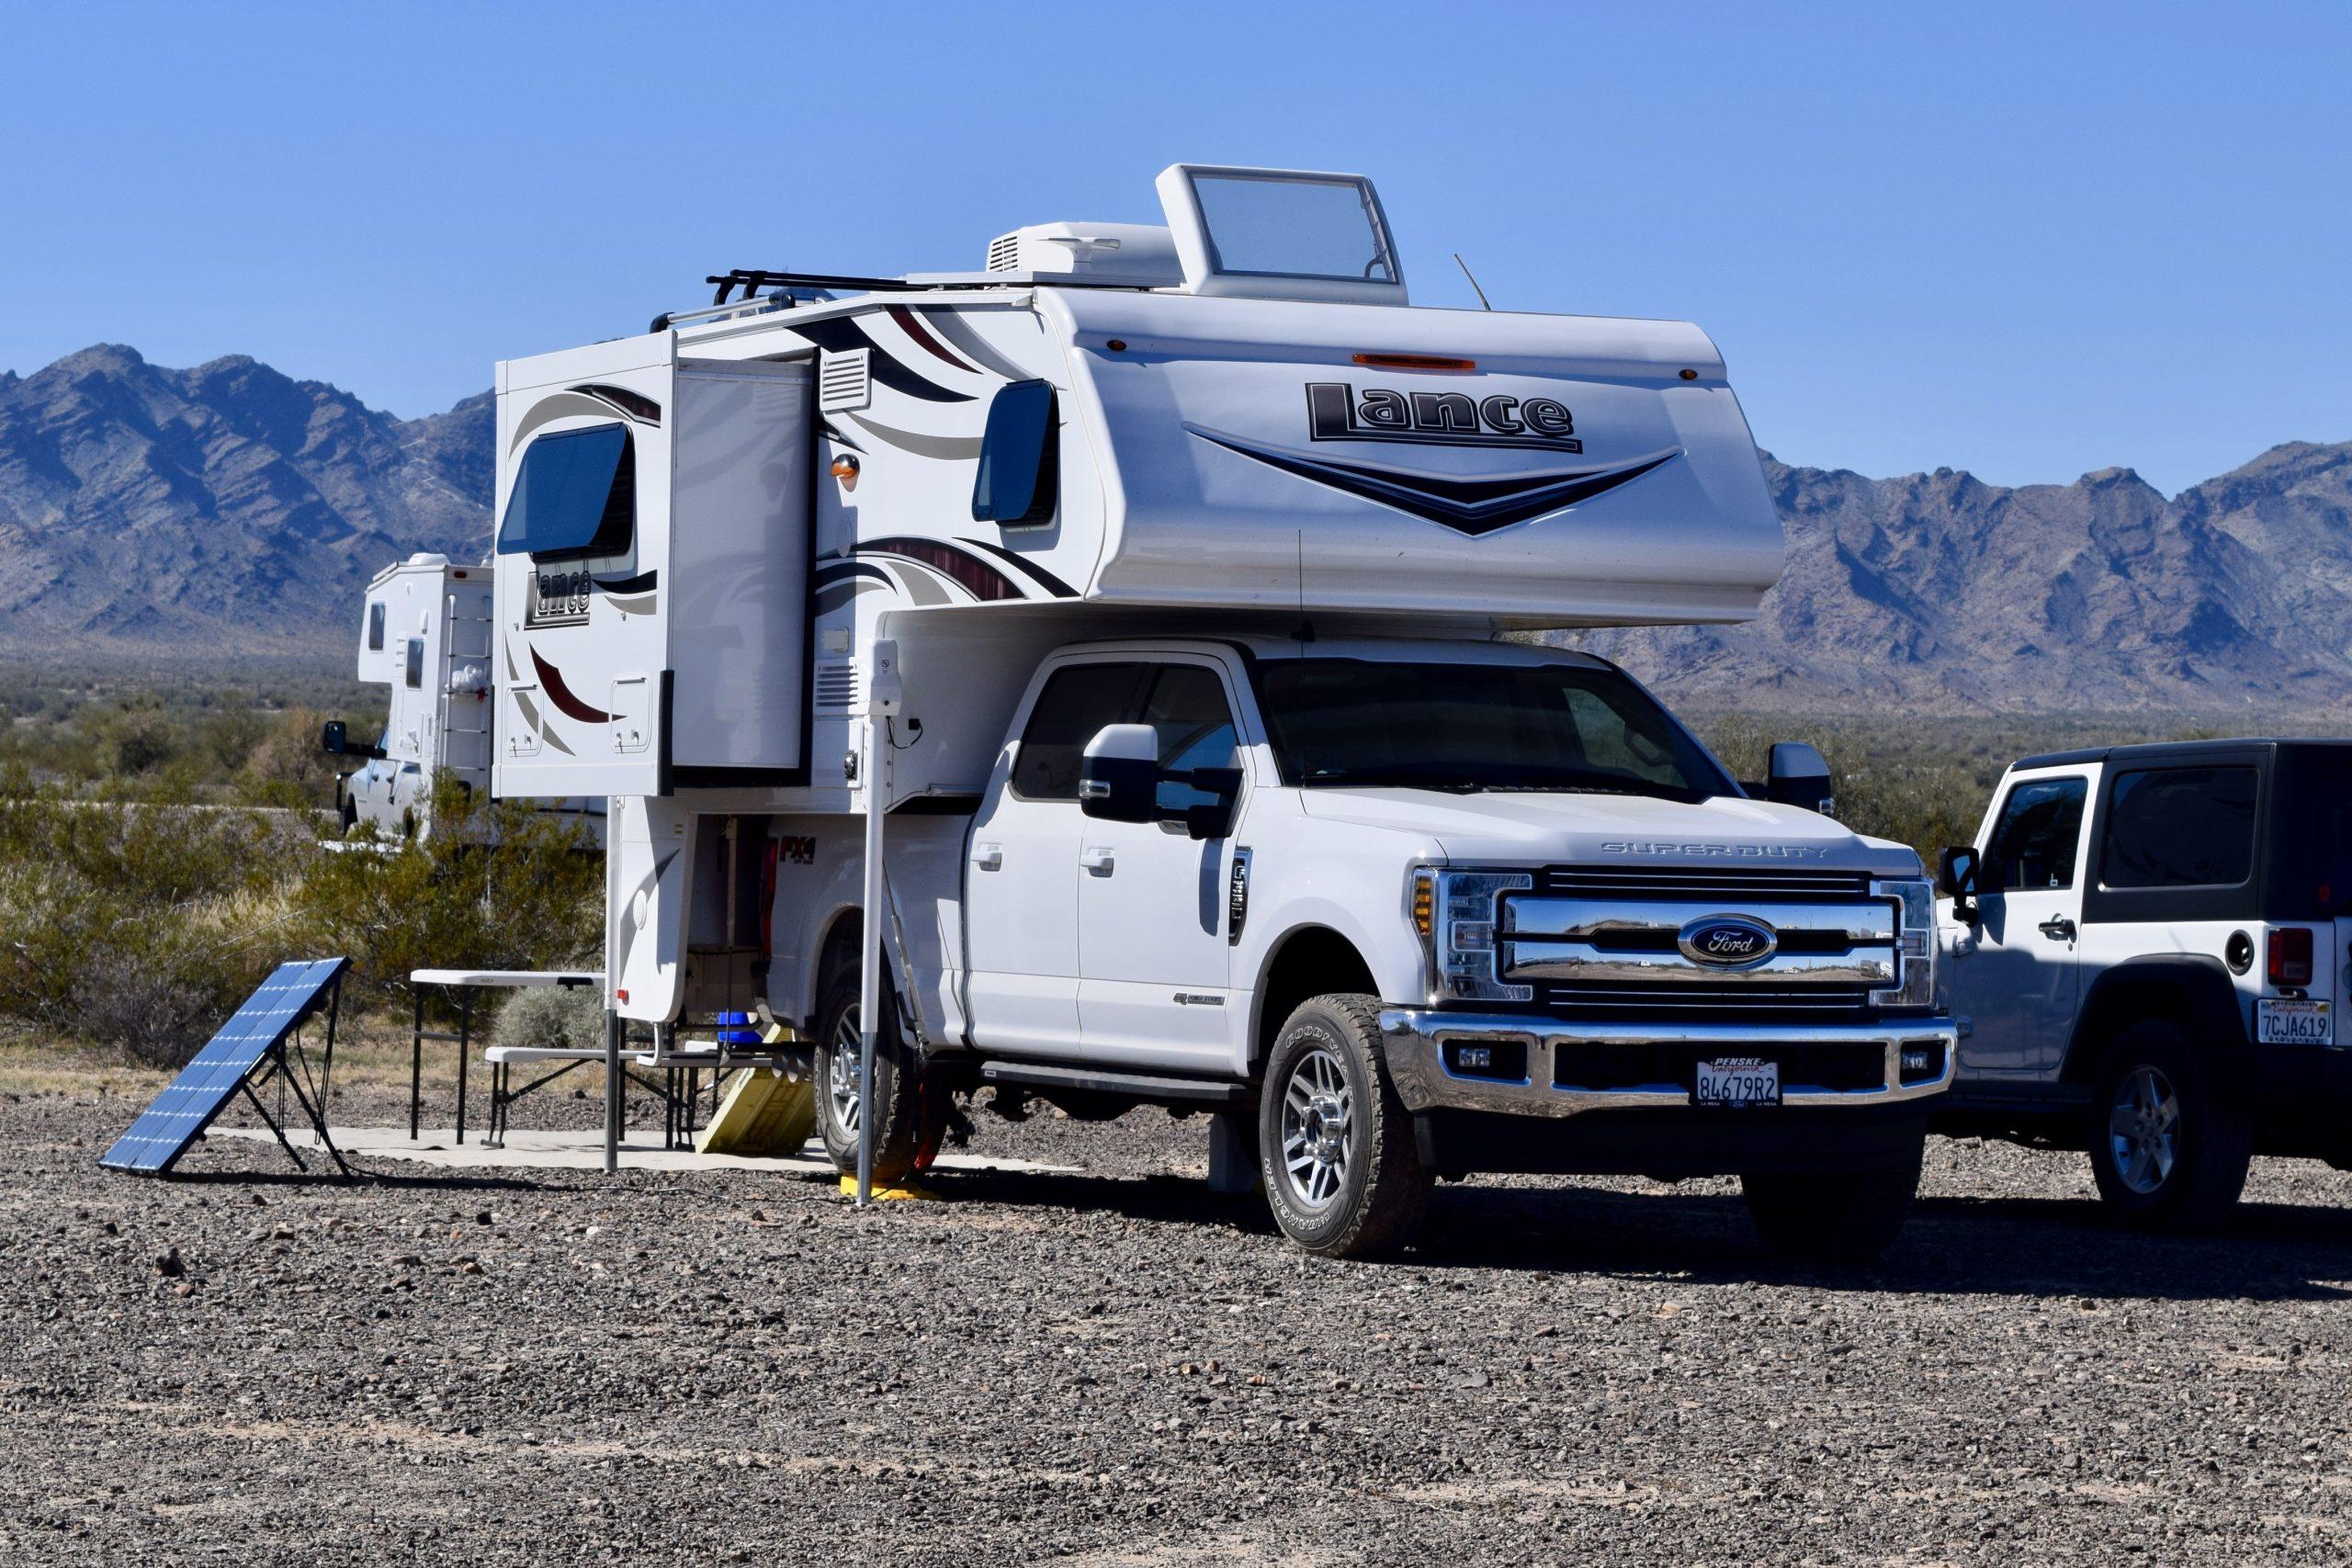 Top 8 Slide Out Truck Campers For Short Bed Trucks Truck Camper Adventure